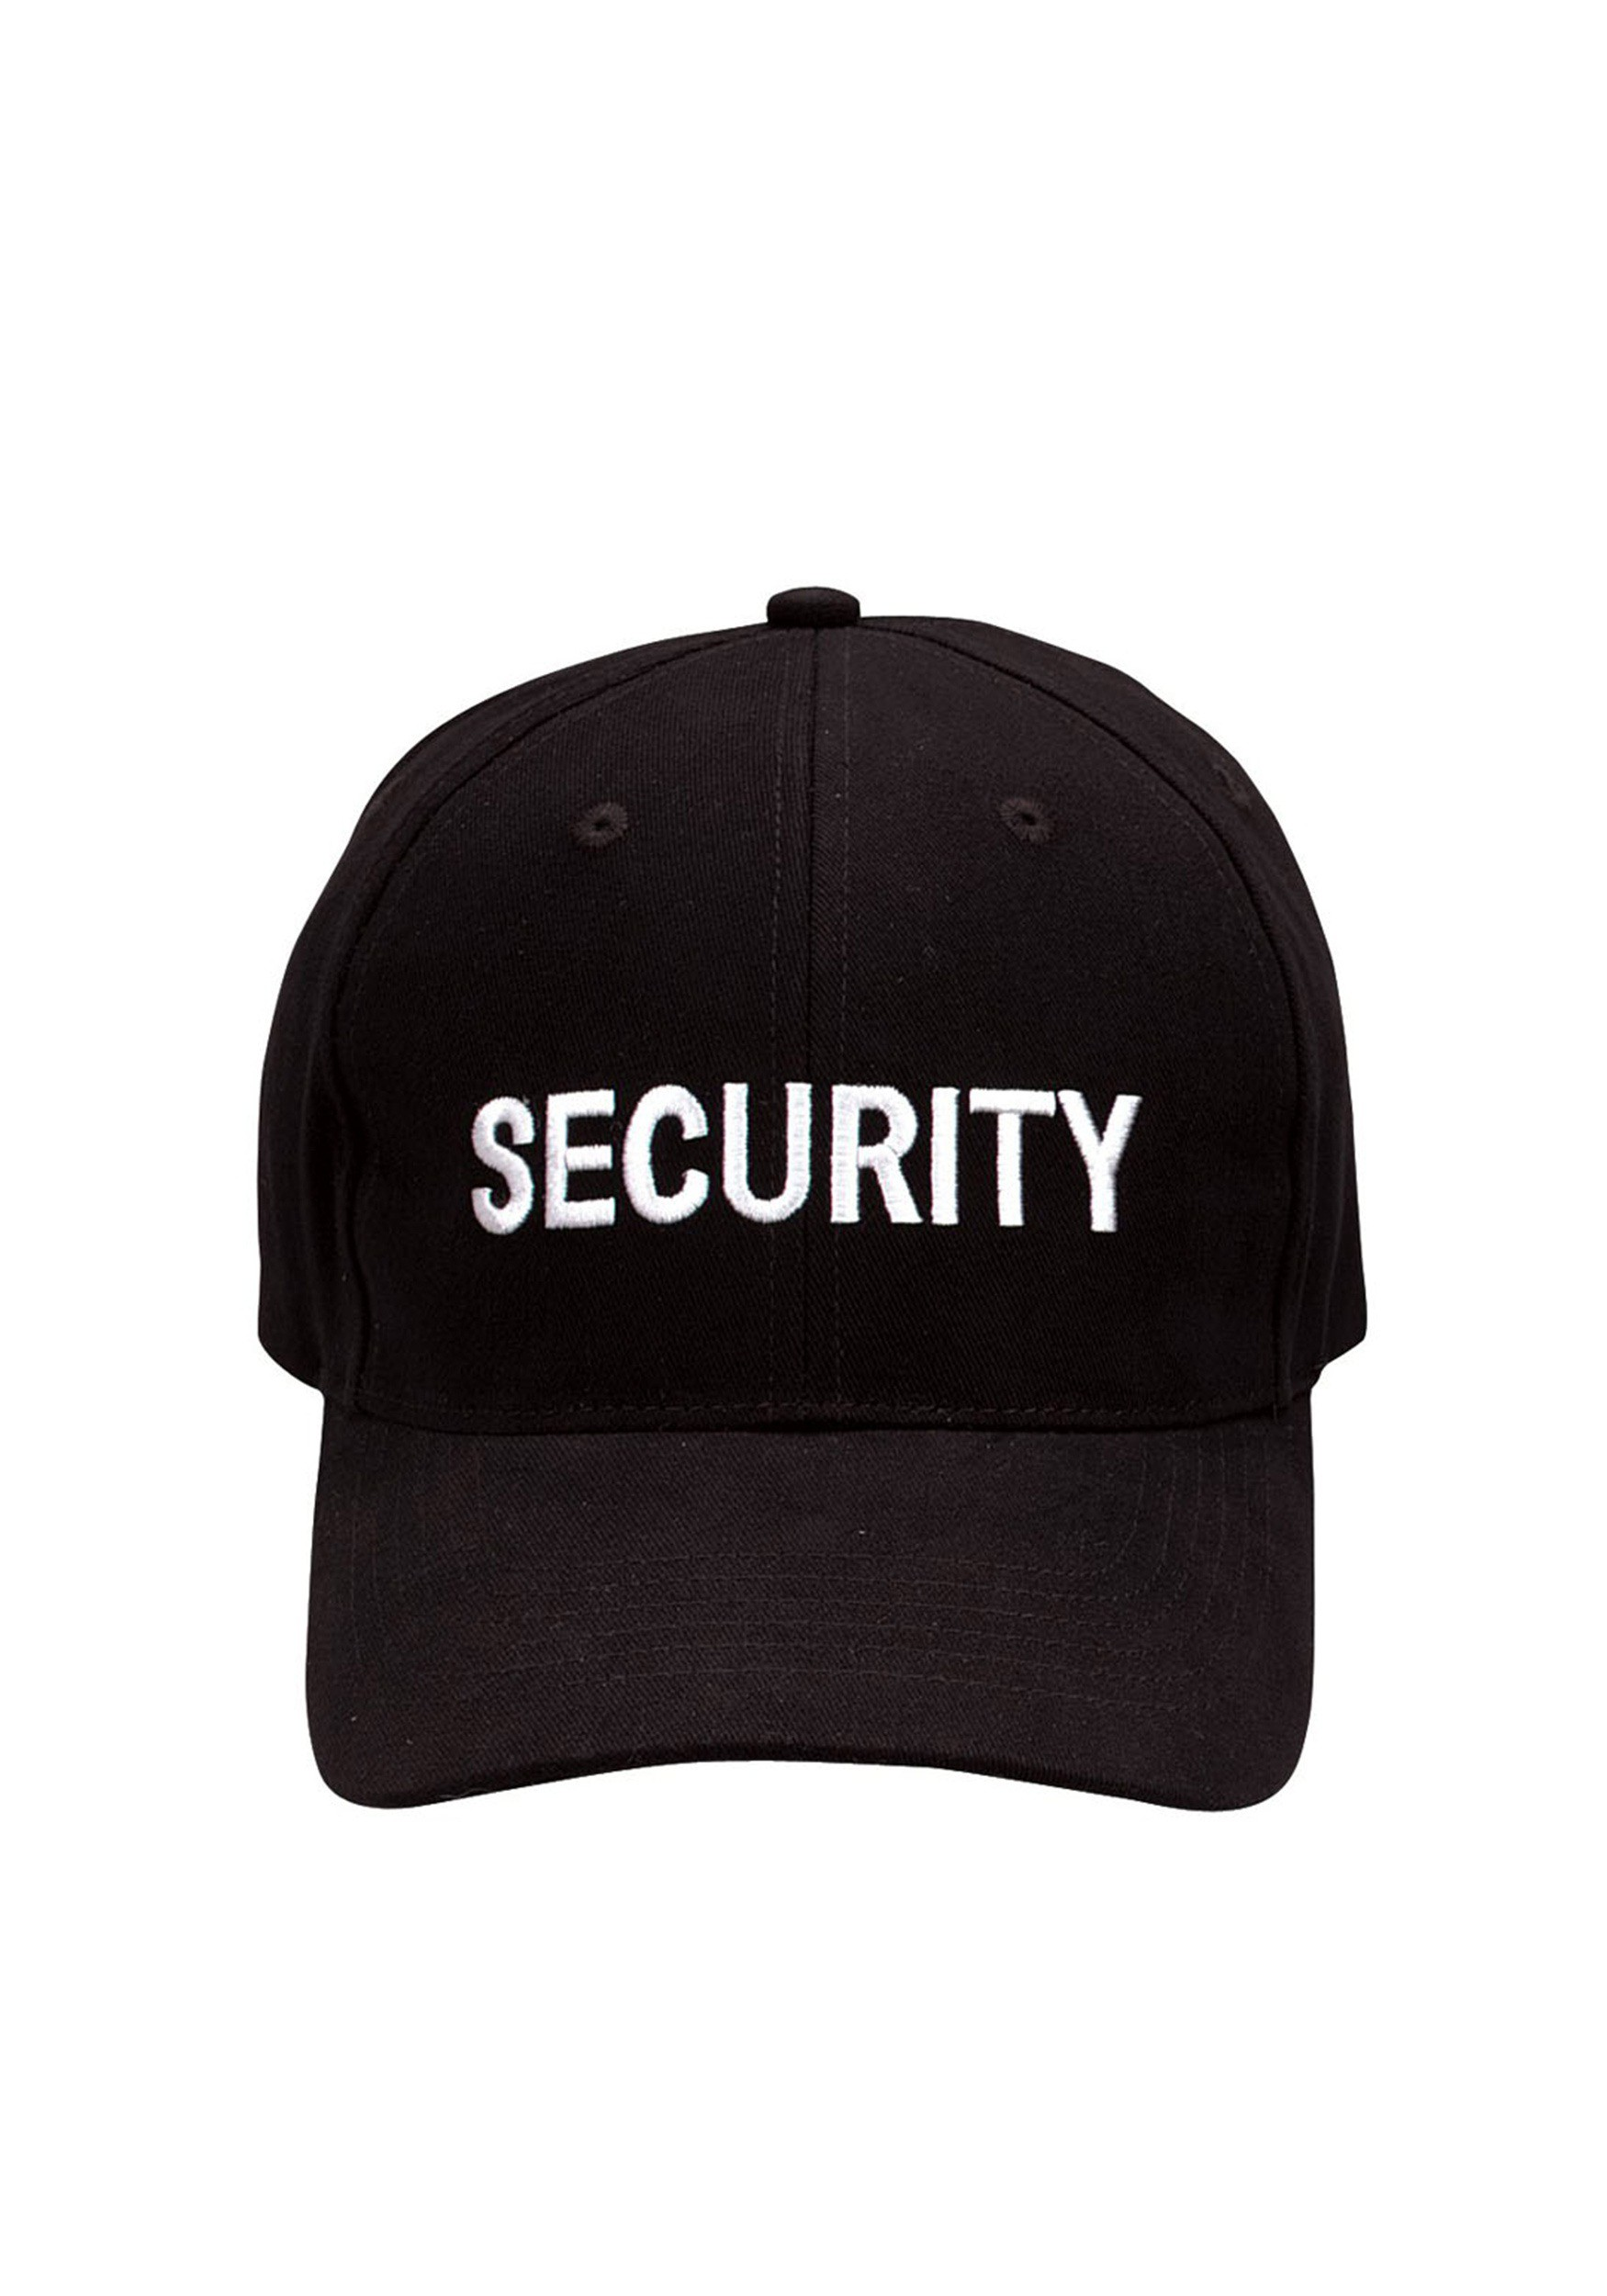 adult-security-baseball-cap.jpg ce8c75d17f2